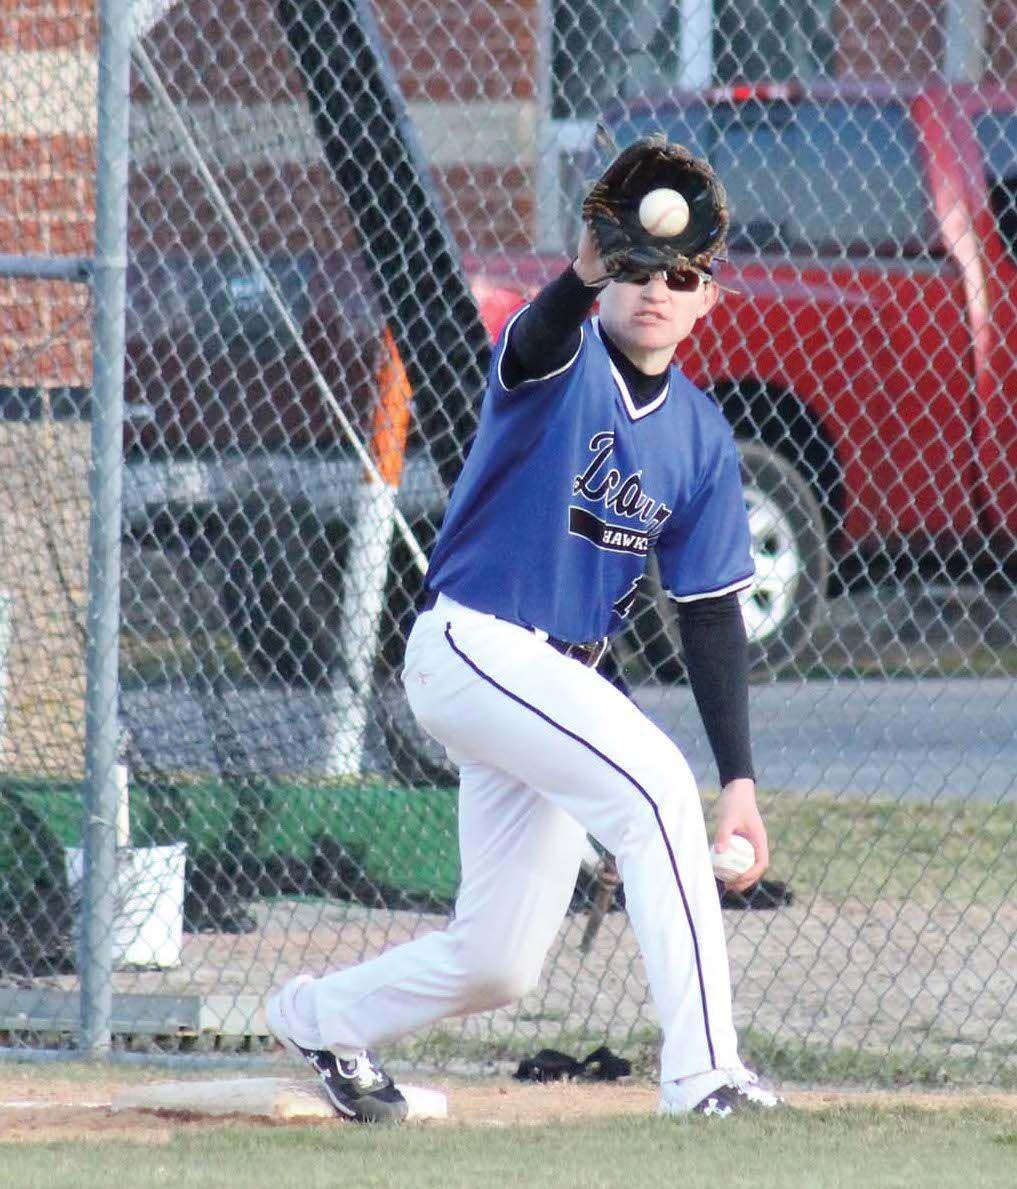 SD baseball preview 2019